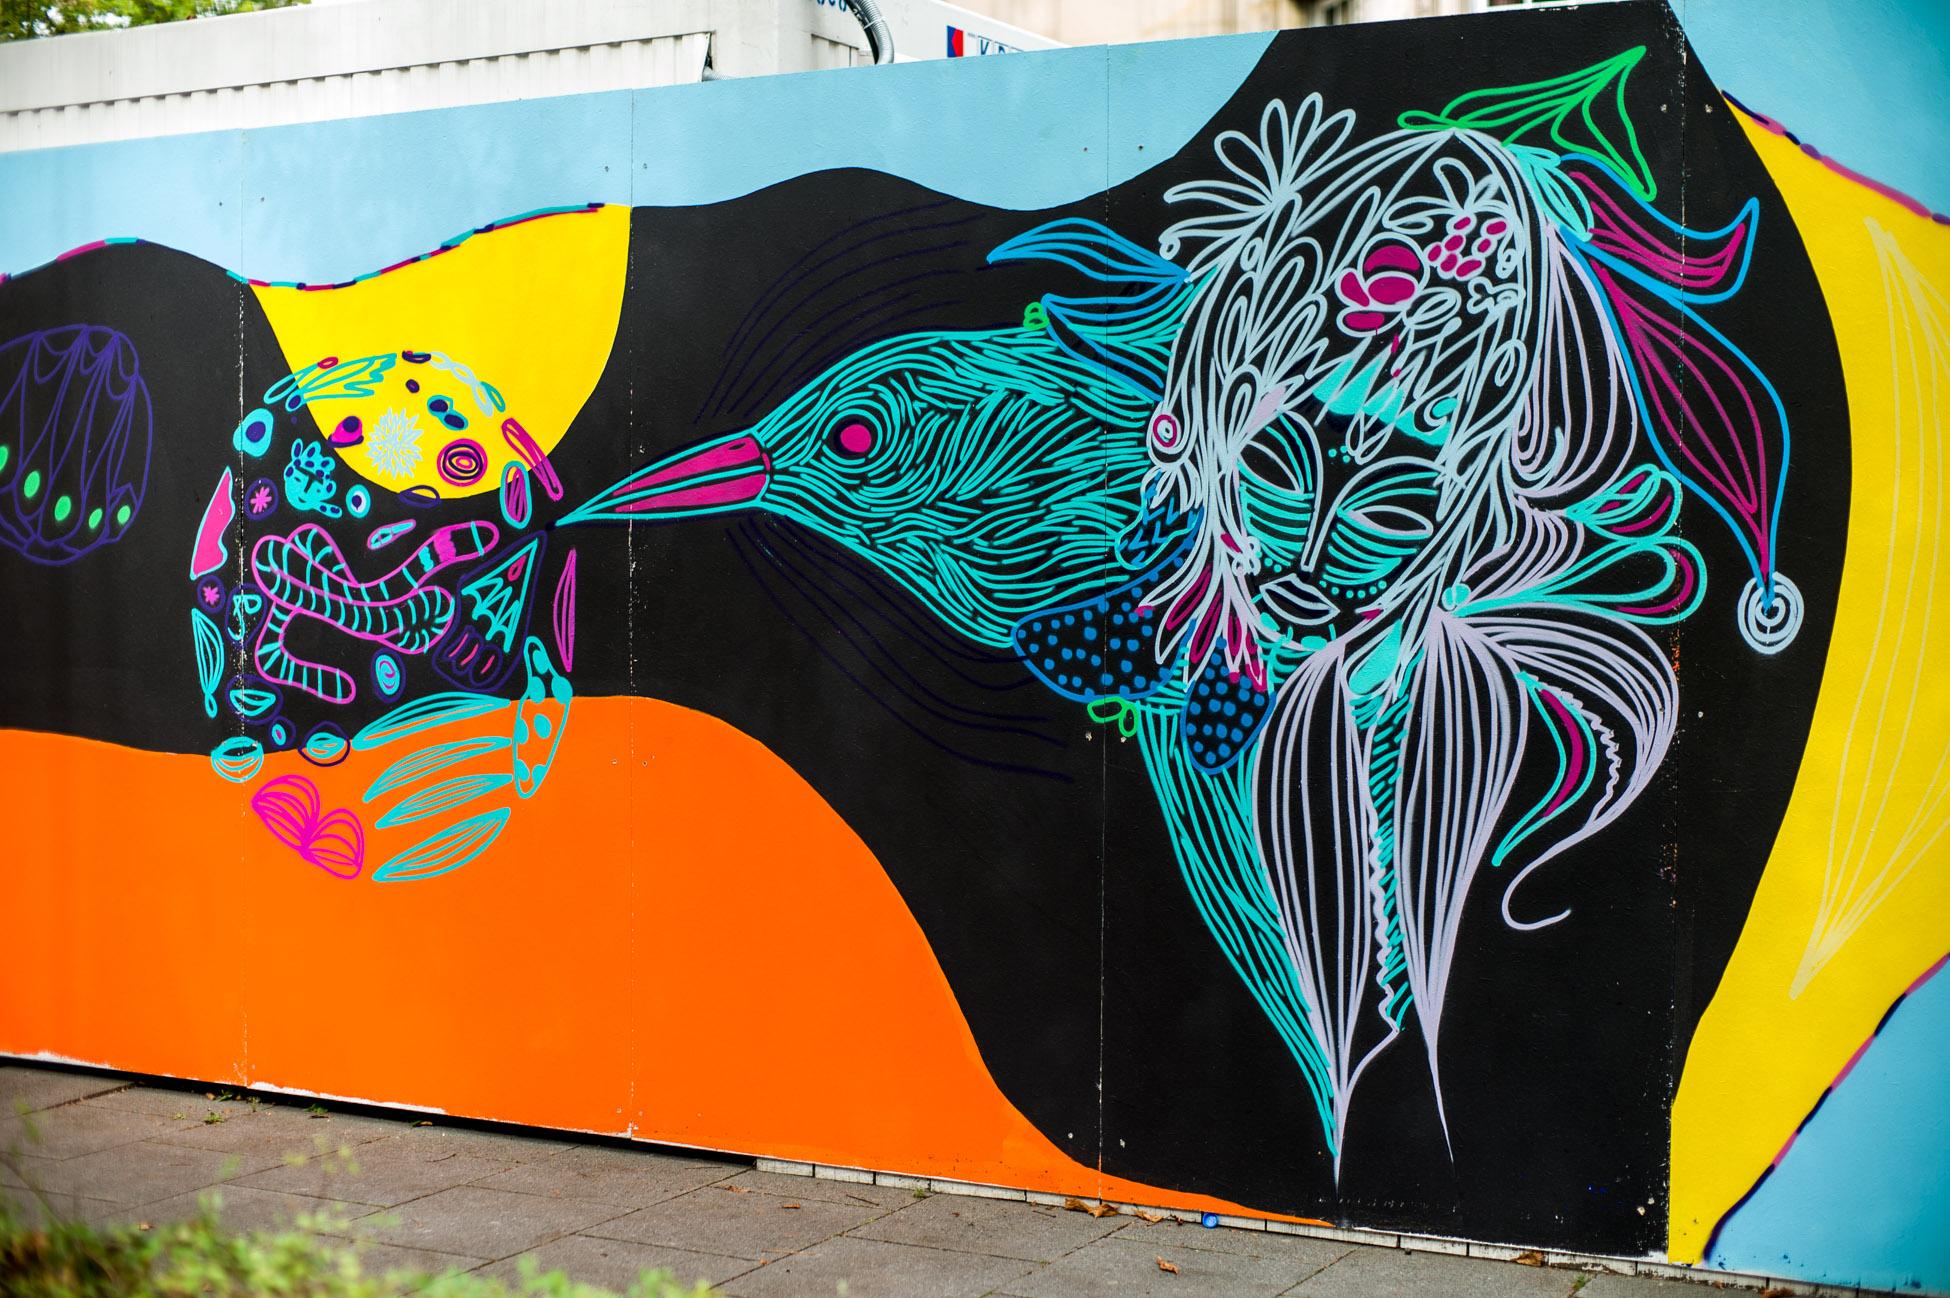 Streetart_Brazil_Rimon guimaraes_2013_Frankfurt (1 von 15)